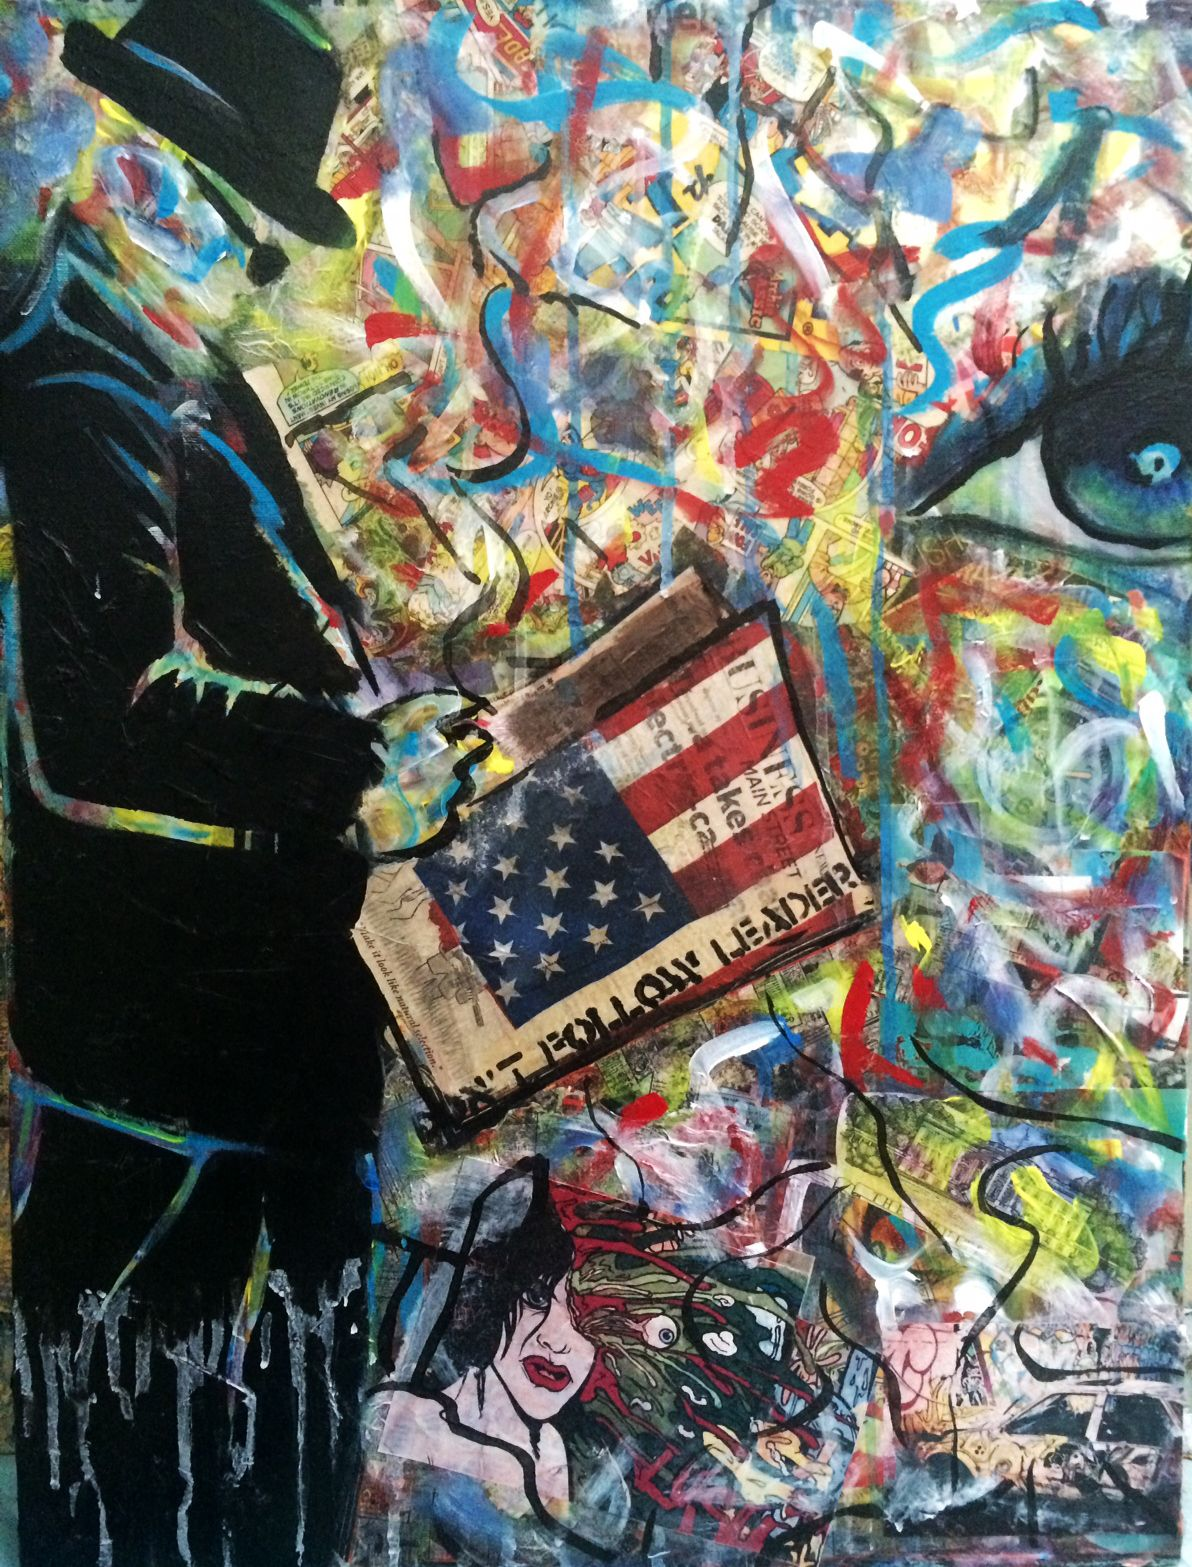 Graffiti art modern contemporary cool spray paint stencil collage